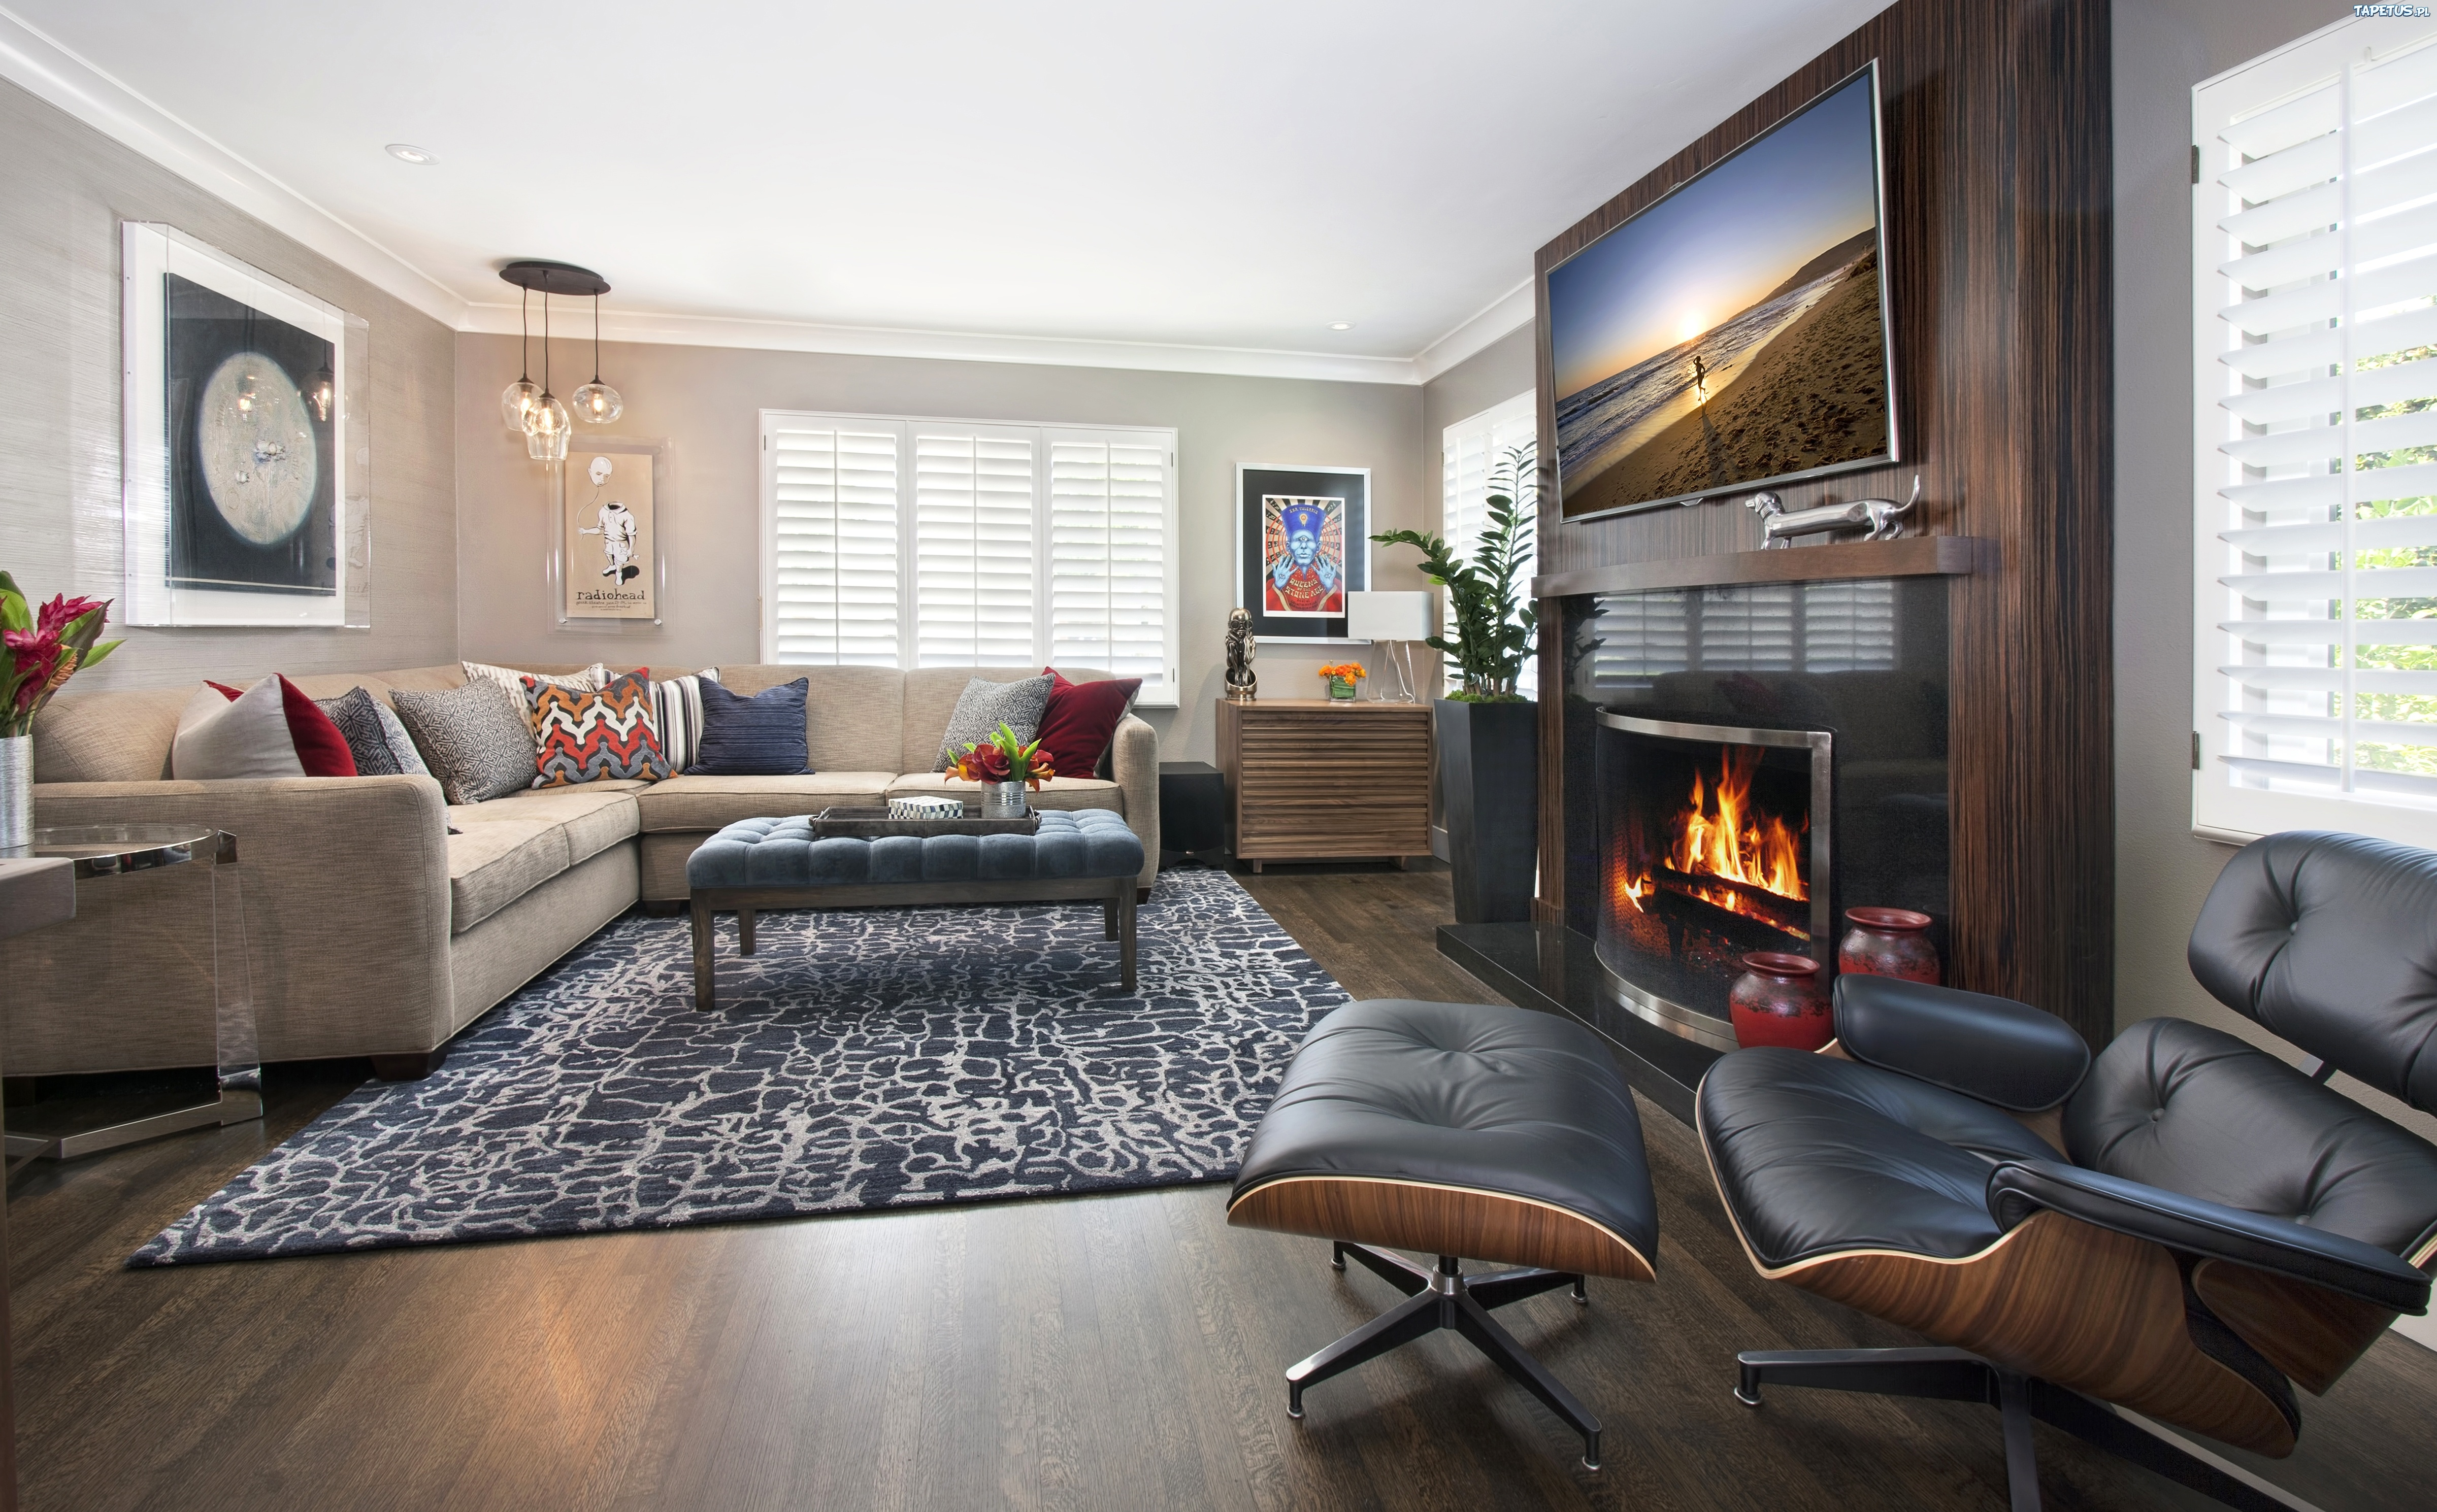 интерьер комната камин стол ковер interior bathroom fireplace table carpet скачать